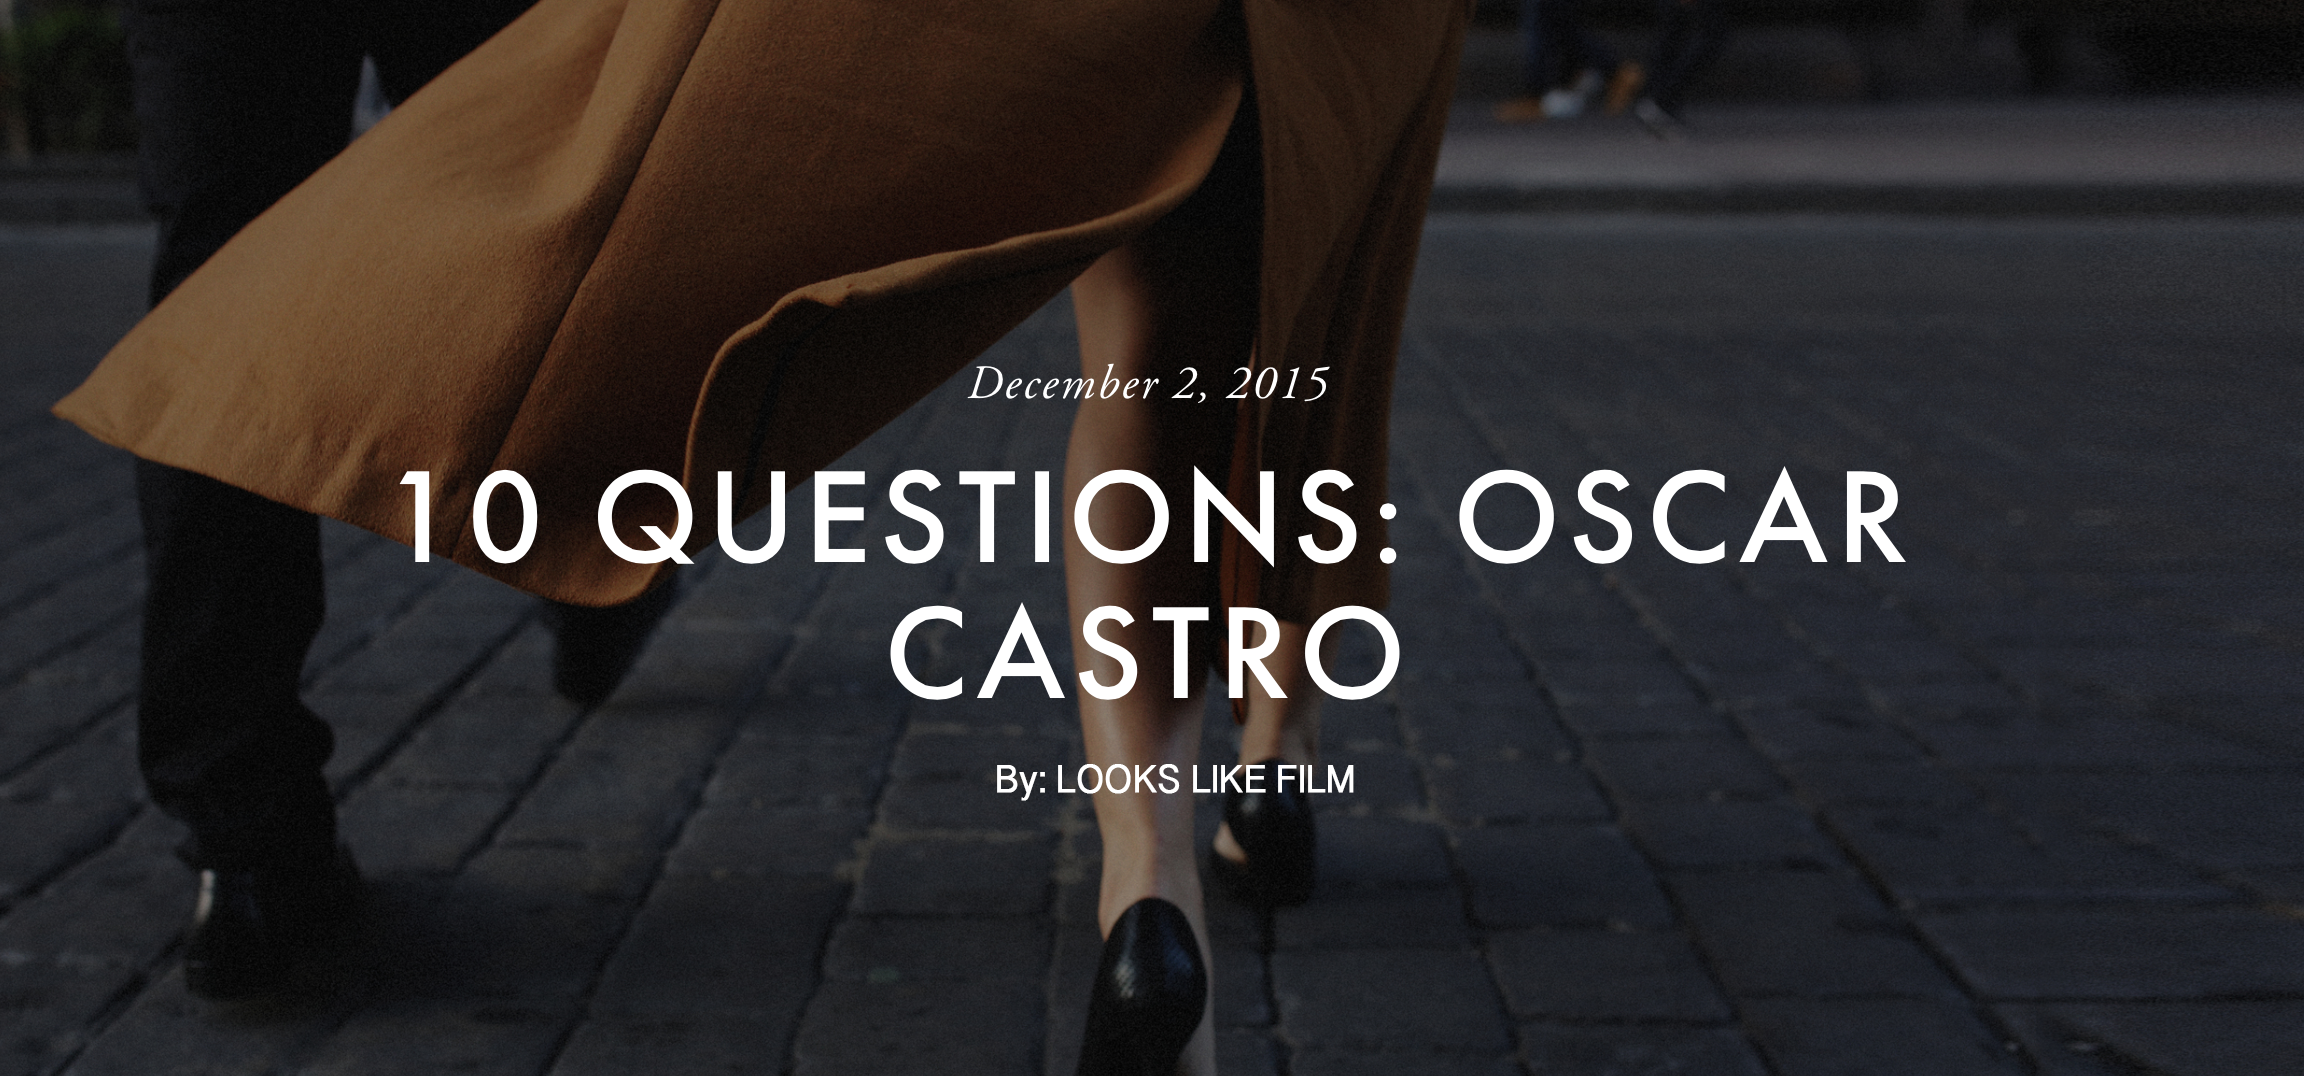 10 Questions / Looks like film